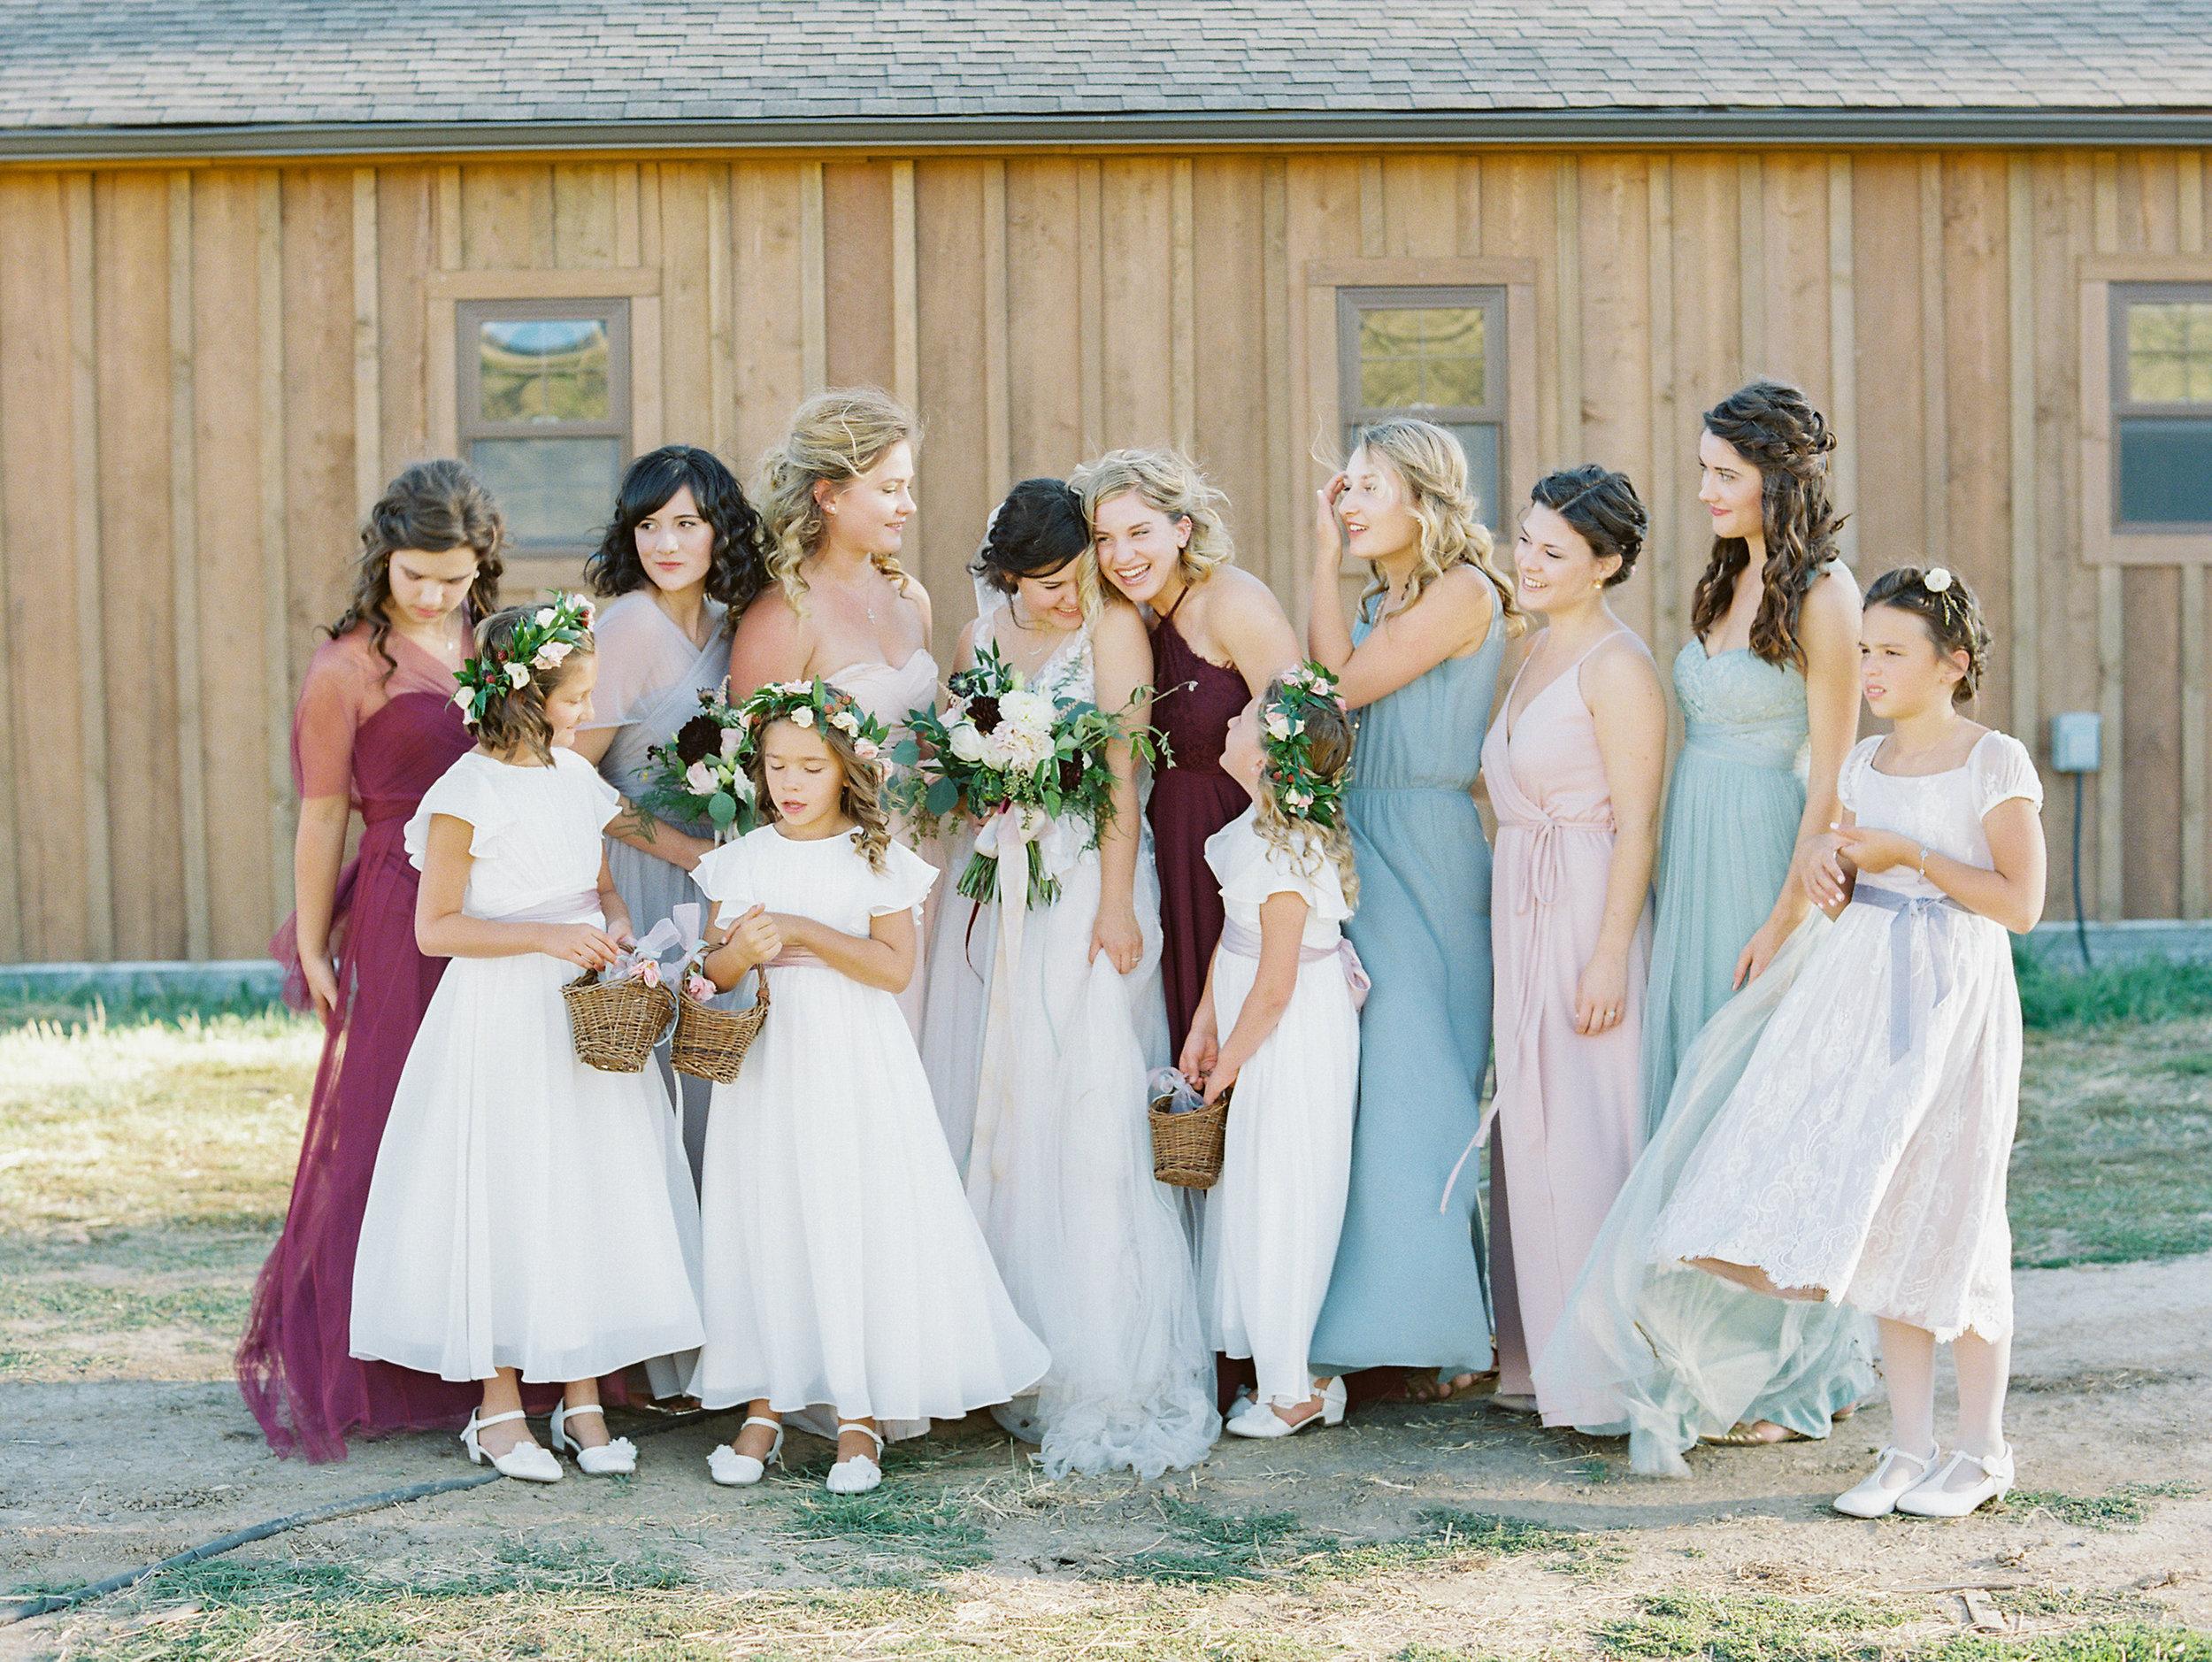 Idaho-Field-Forest-Wedding-Film-Photographer-Kristina-Adams-620.jpg